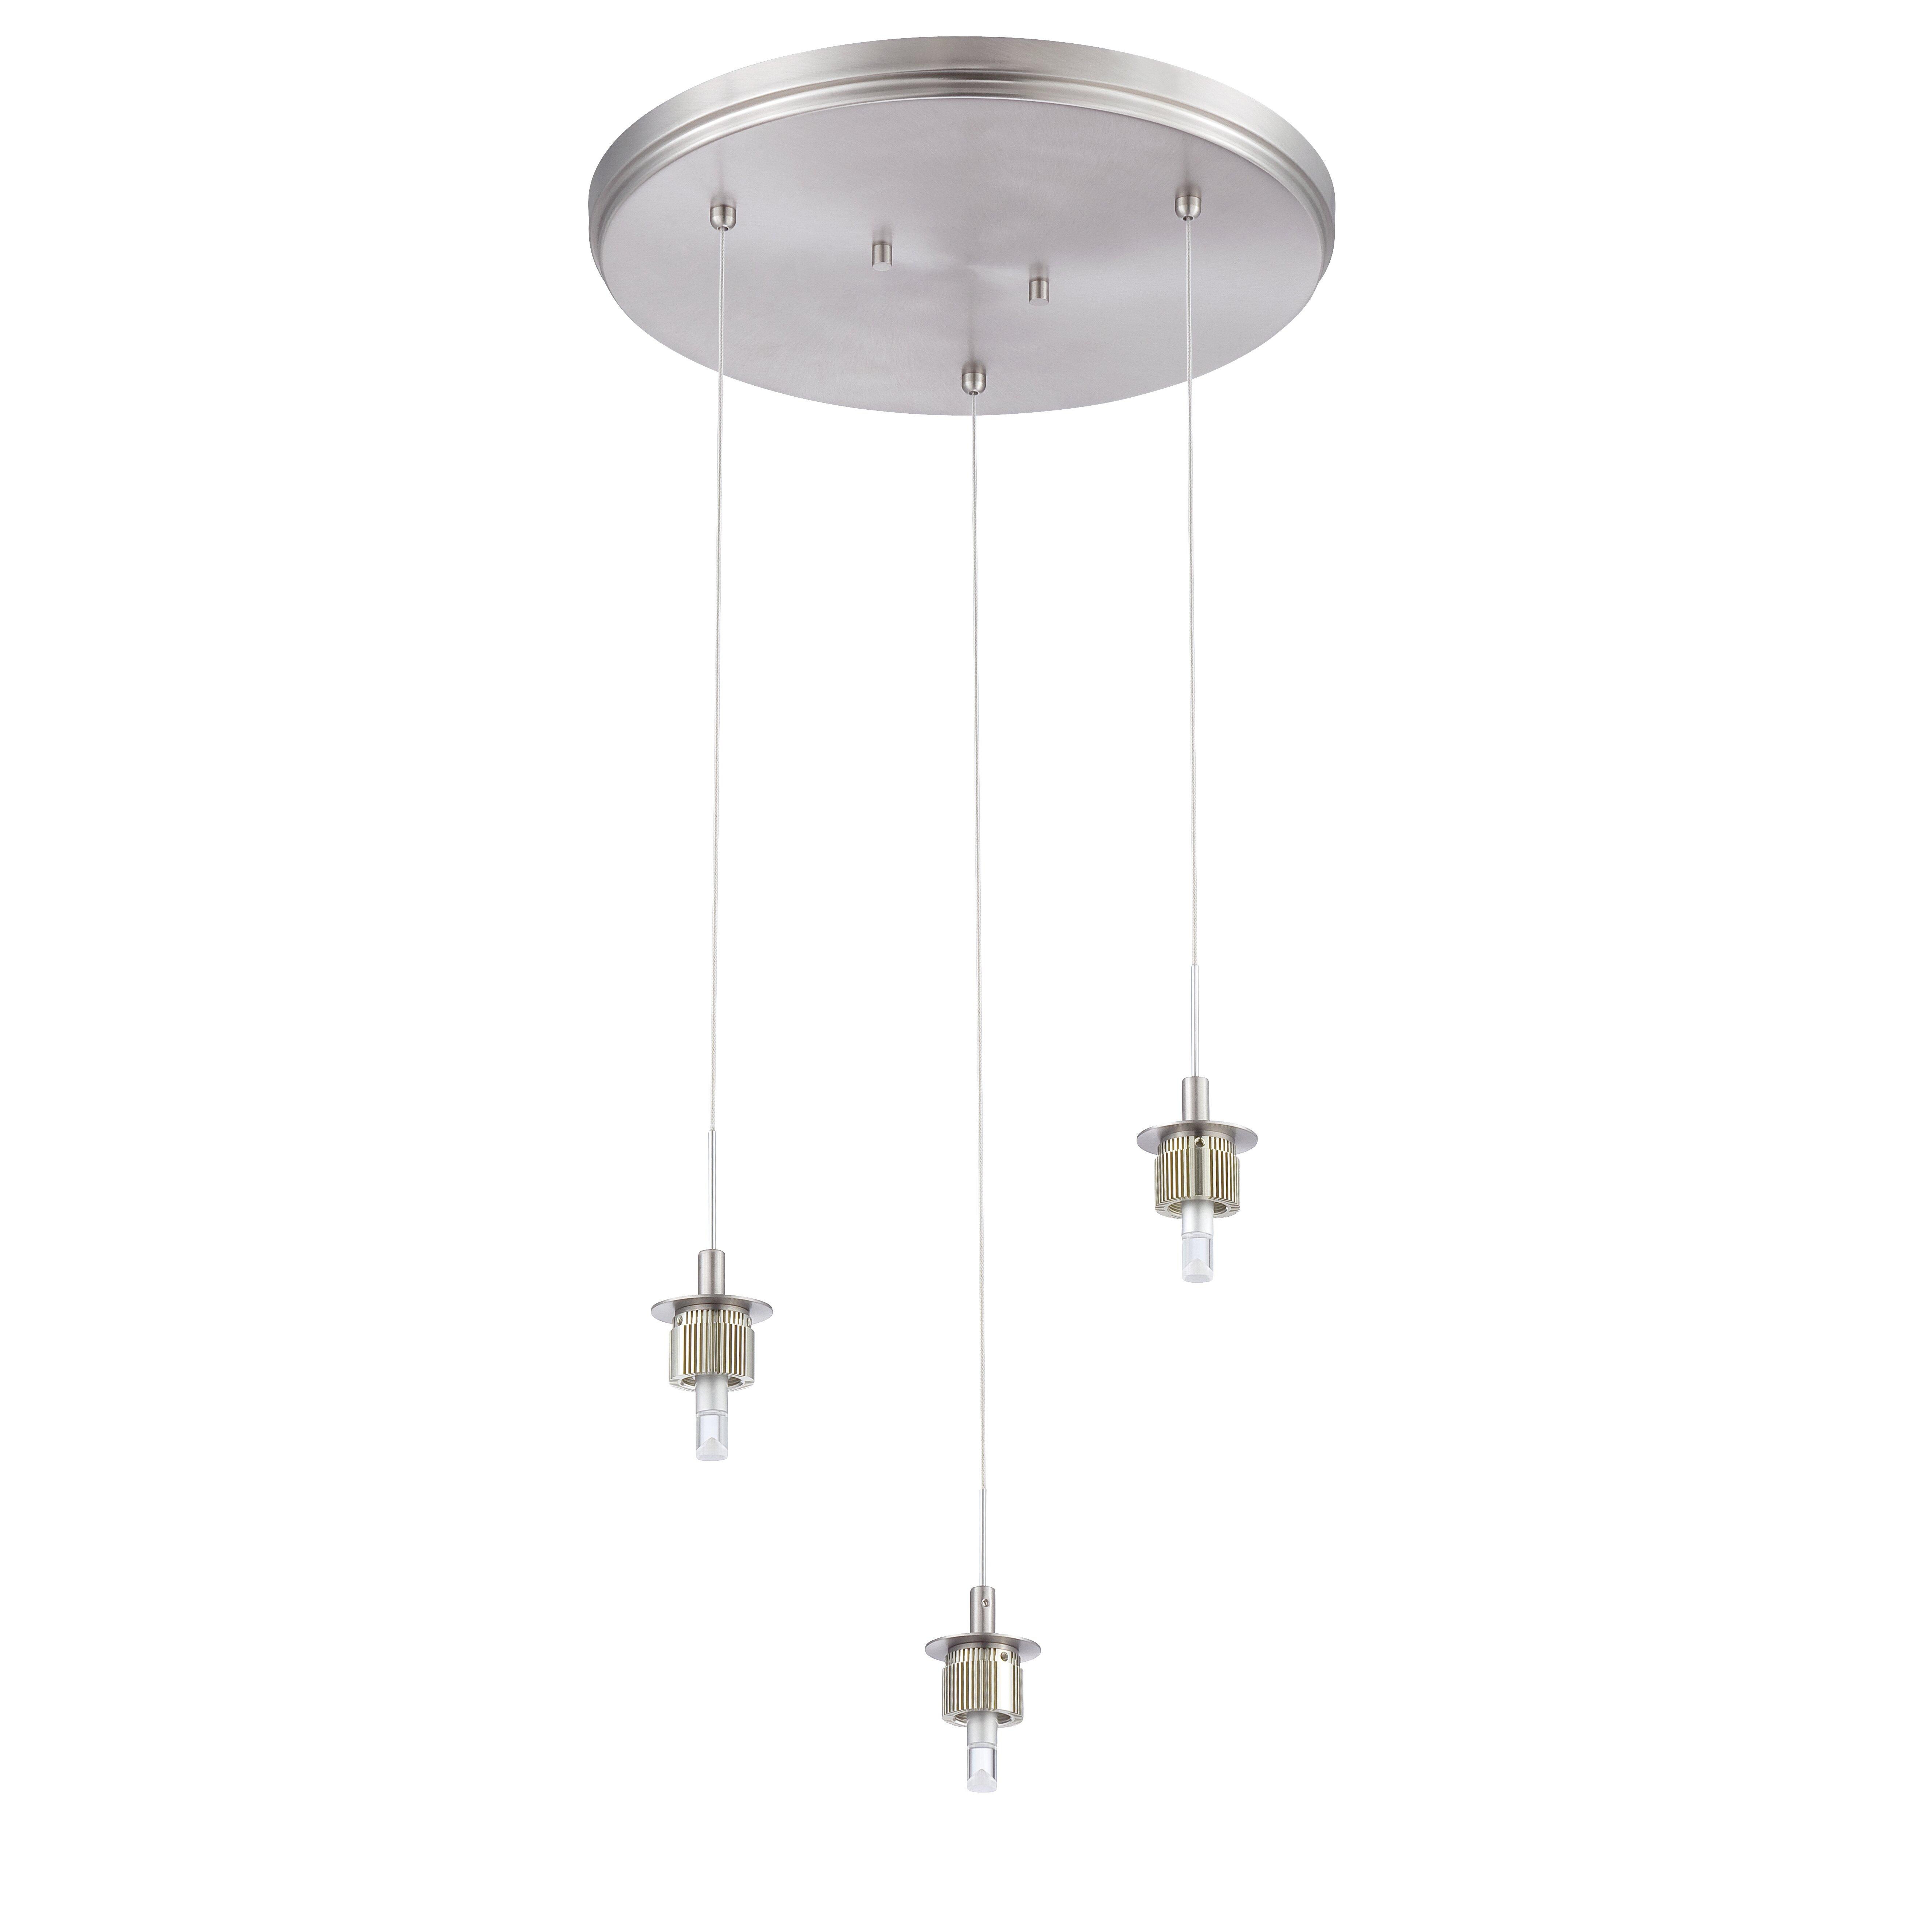 philips consumer luminaire sparkle 3 light pendant allmodern. Black Bedroom Furniture Sets. Home Design Ideas